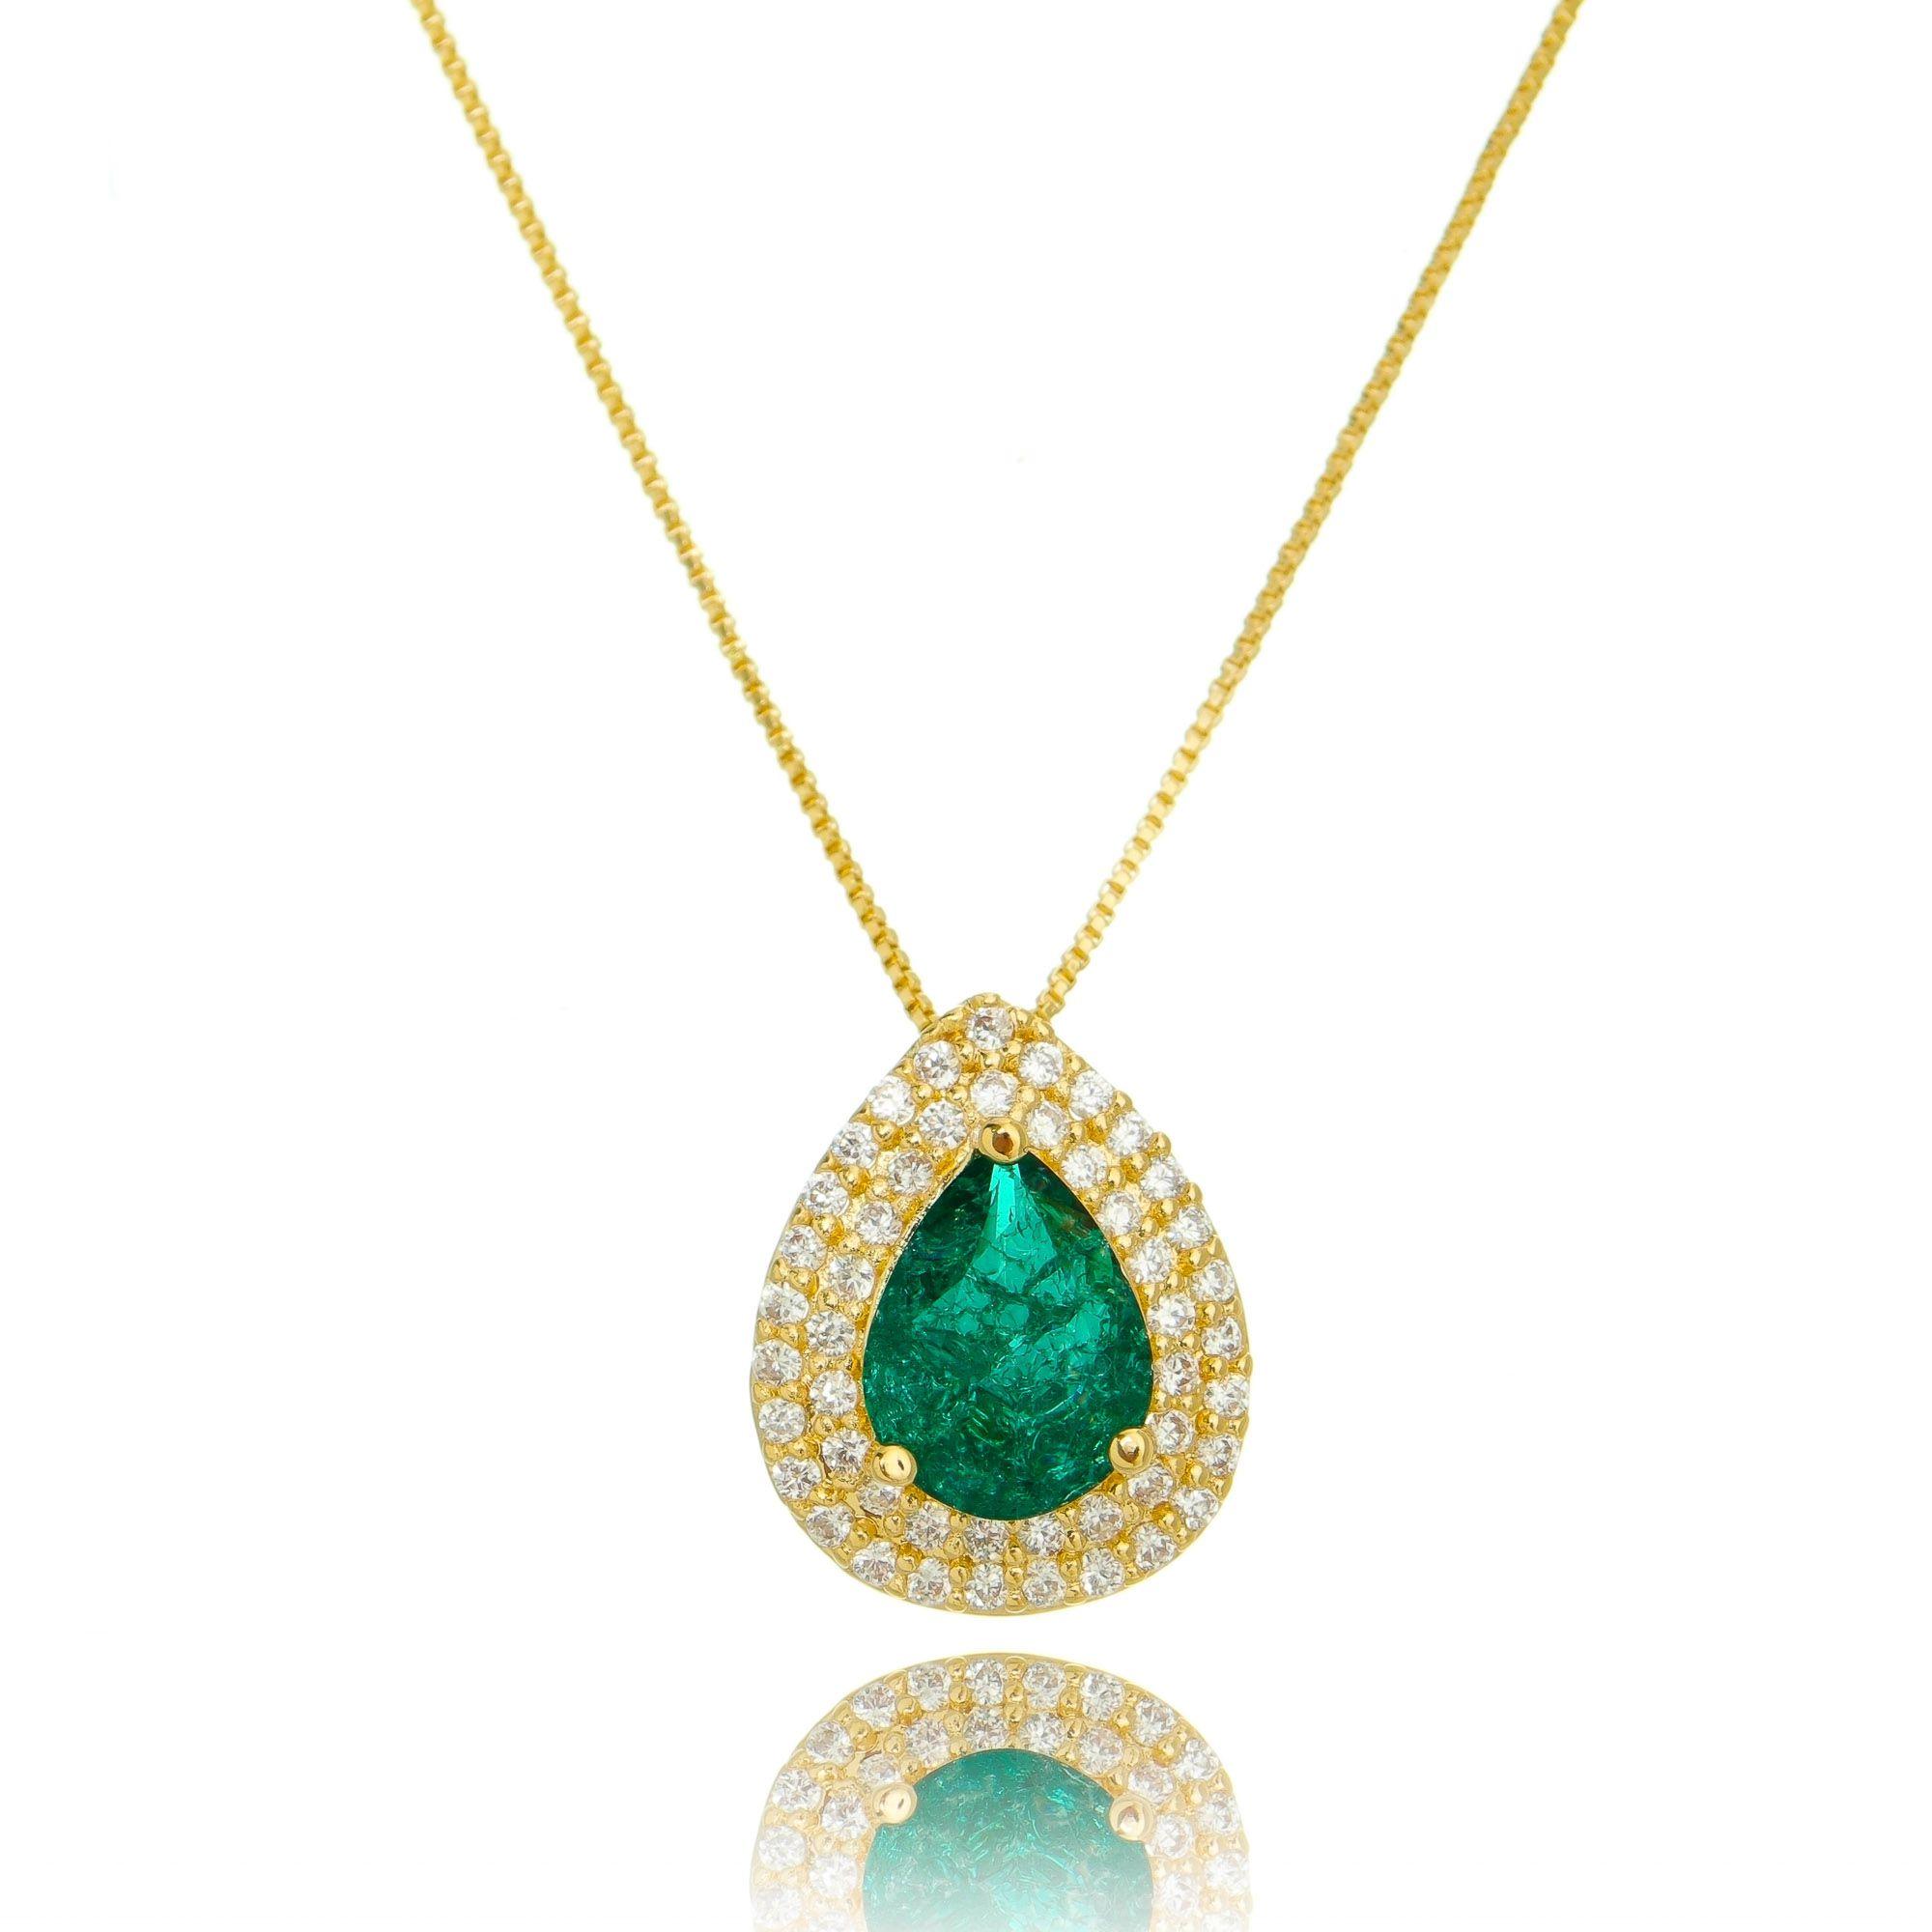 Colar Pingente Fusion Esmeralda e Zircônia Cristal Gota Semijoia Ouro  - Soloyou